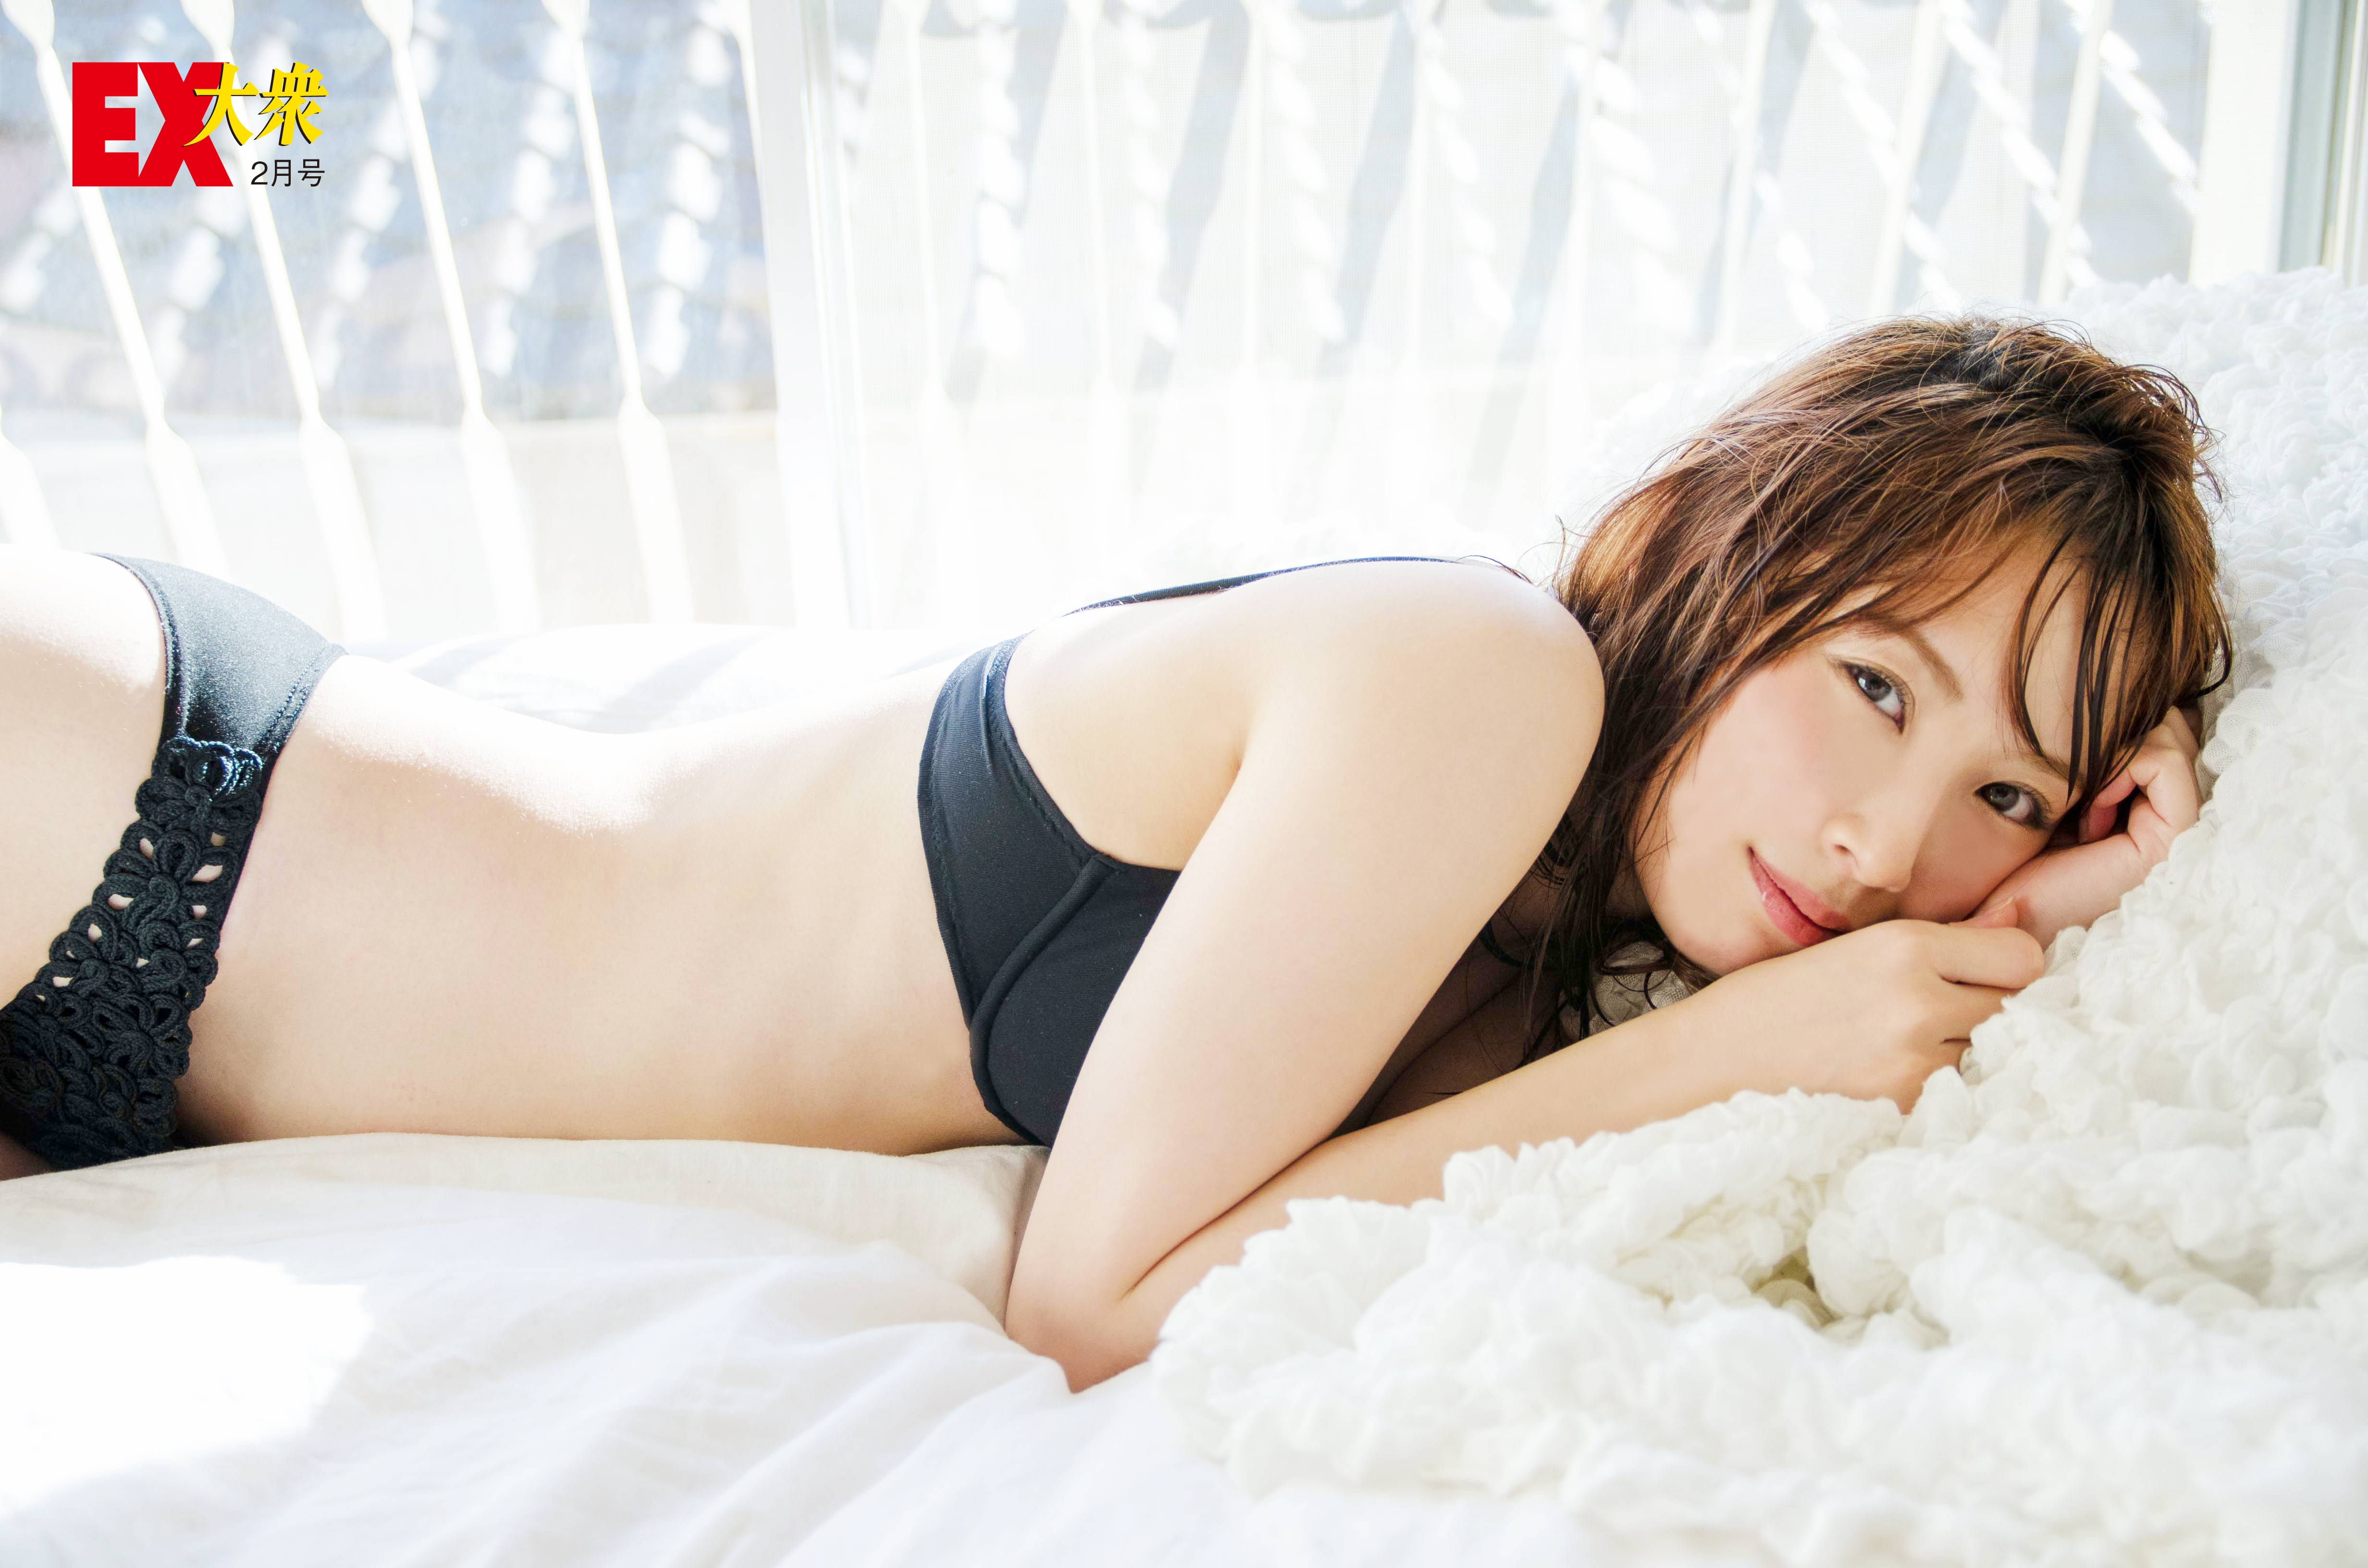 SKE48高柳明音の本誌未掲載カット5枚を大公開!【EX大衆2月号】の画像005